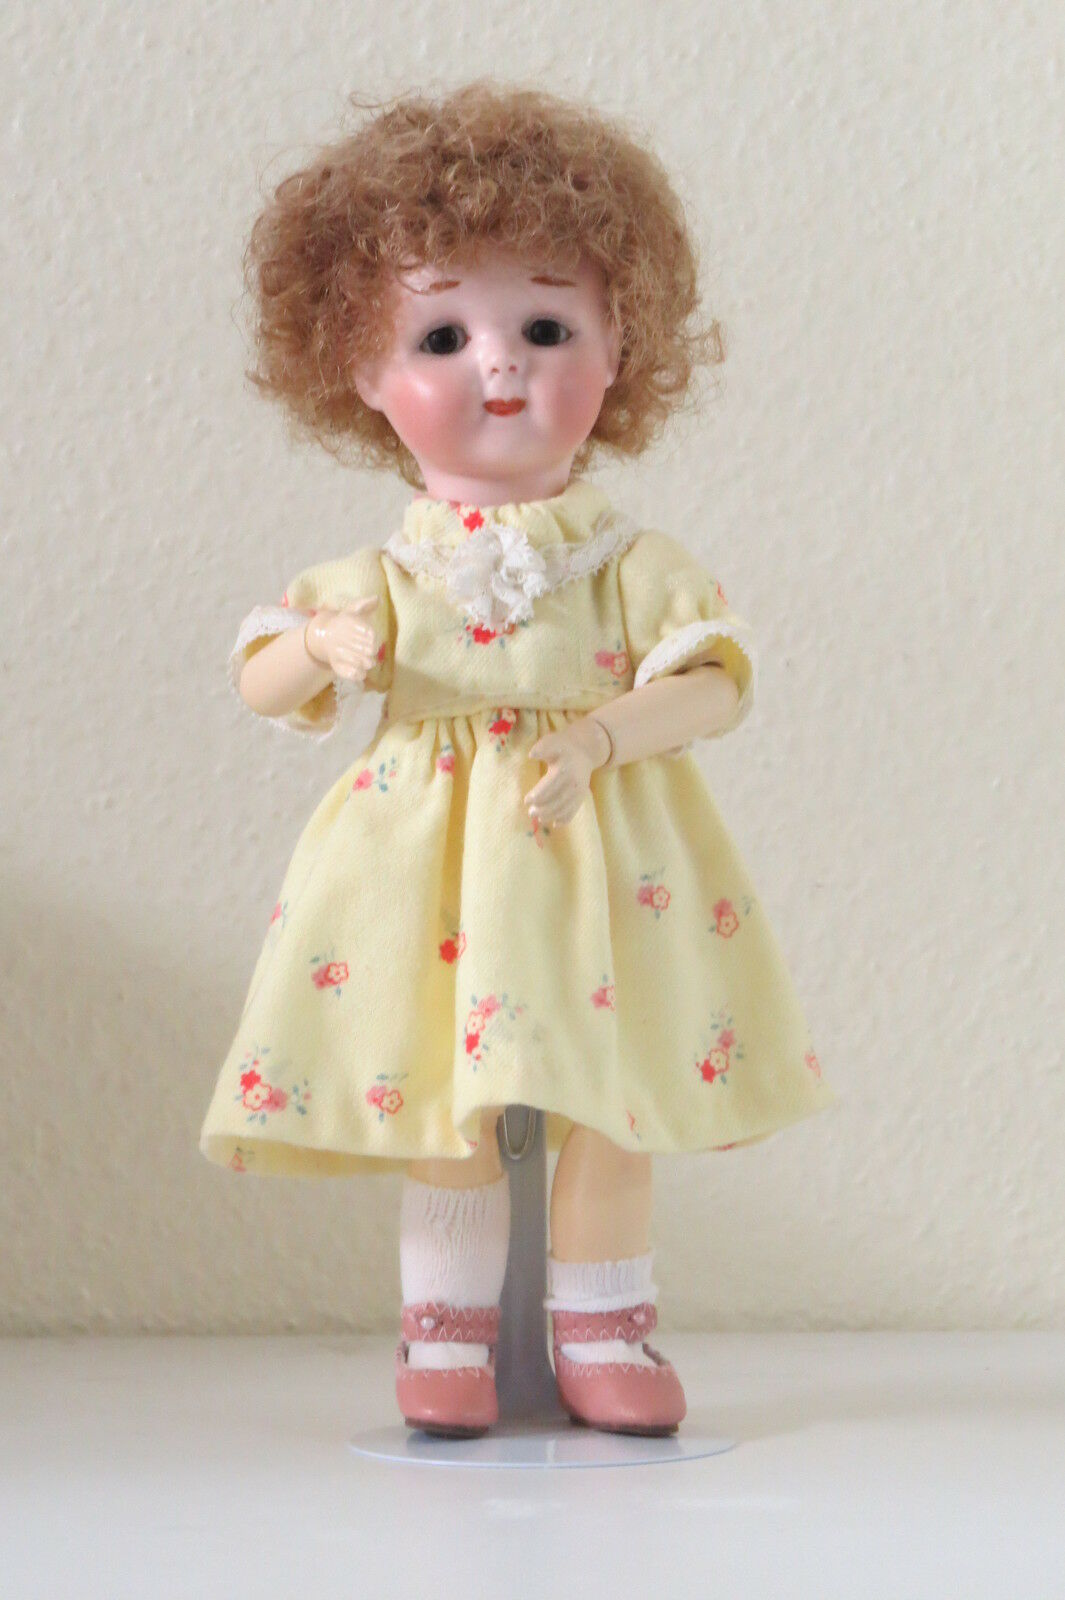 Googlie A.M 243 24 cm 9,6 Pulgadas Muñeca Antigua Reproducción Antique doll